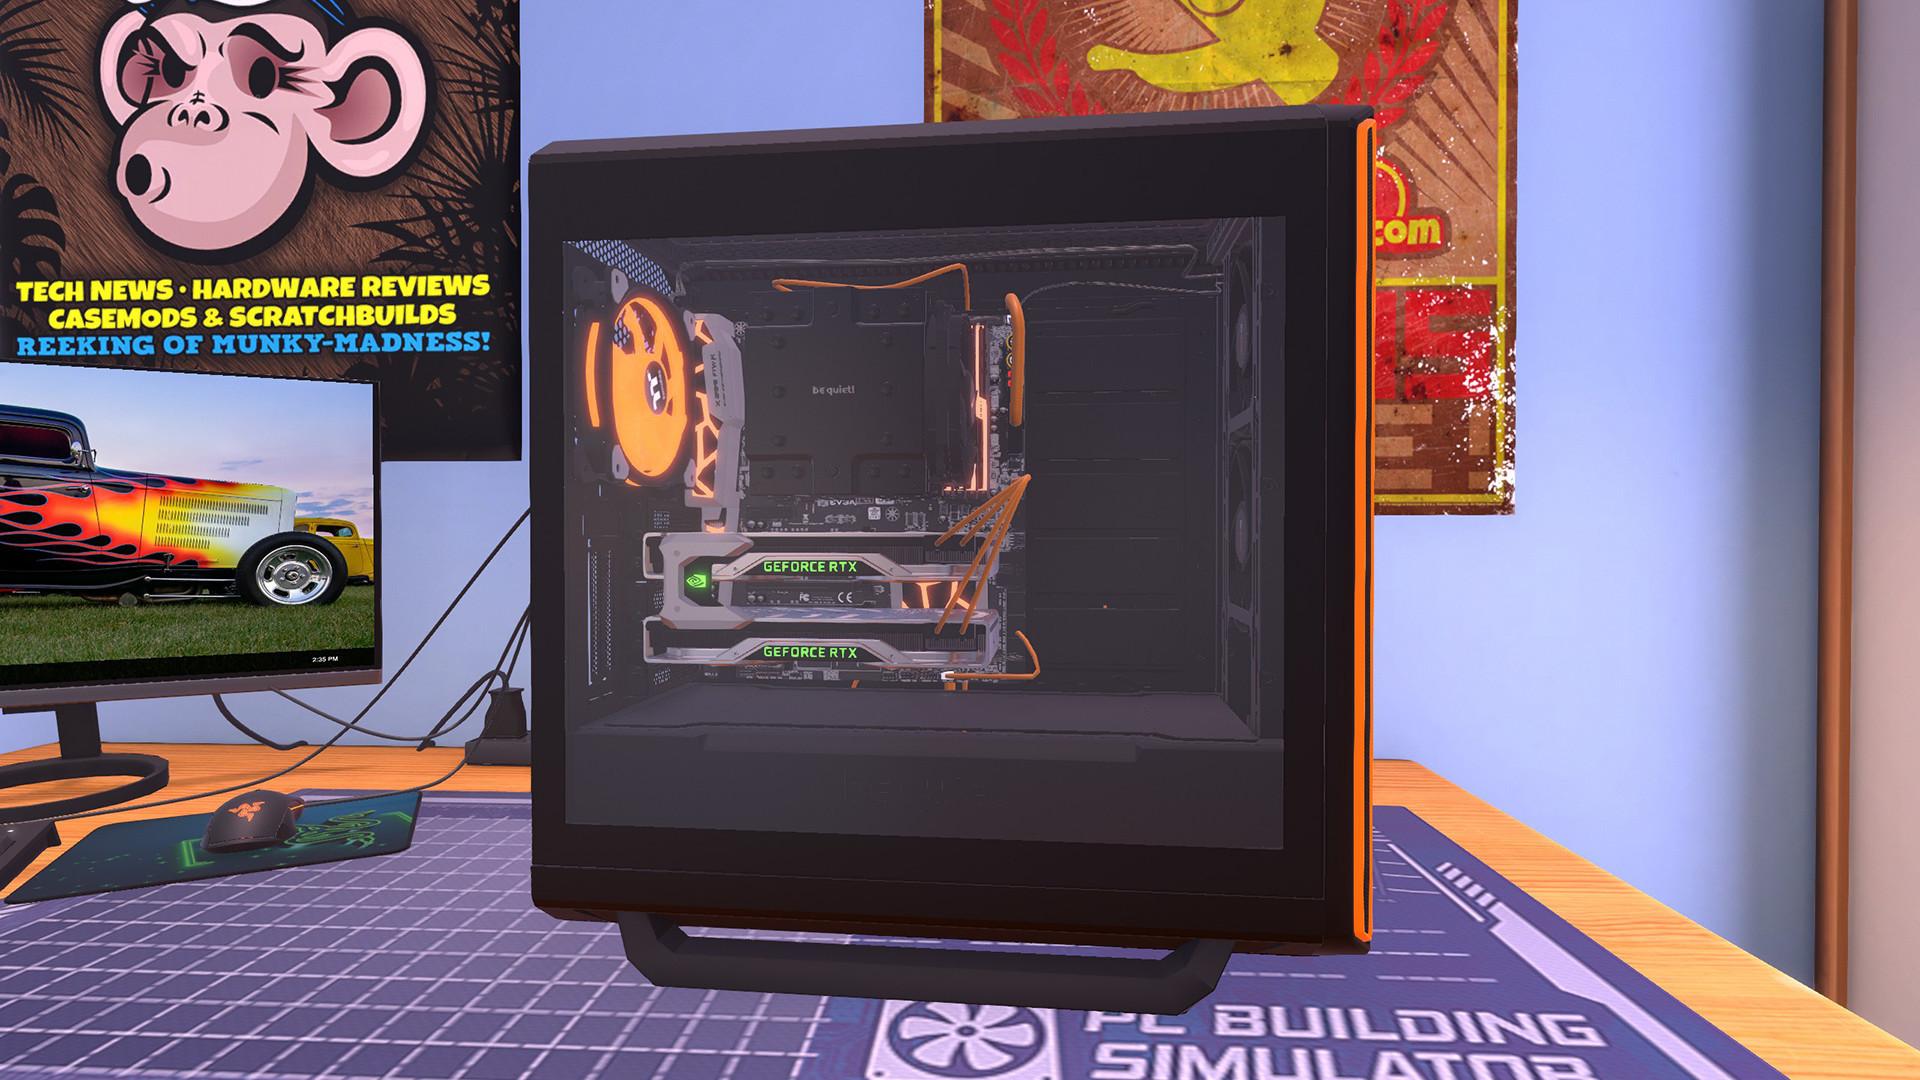 PC Building Simulator 4 miljoen keer free of charge geclaimd op Epic Games Store thumbnail